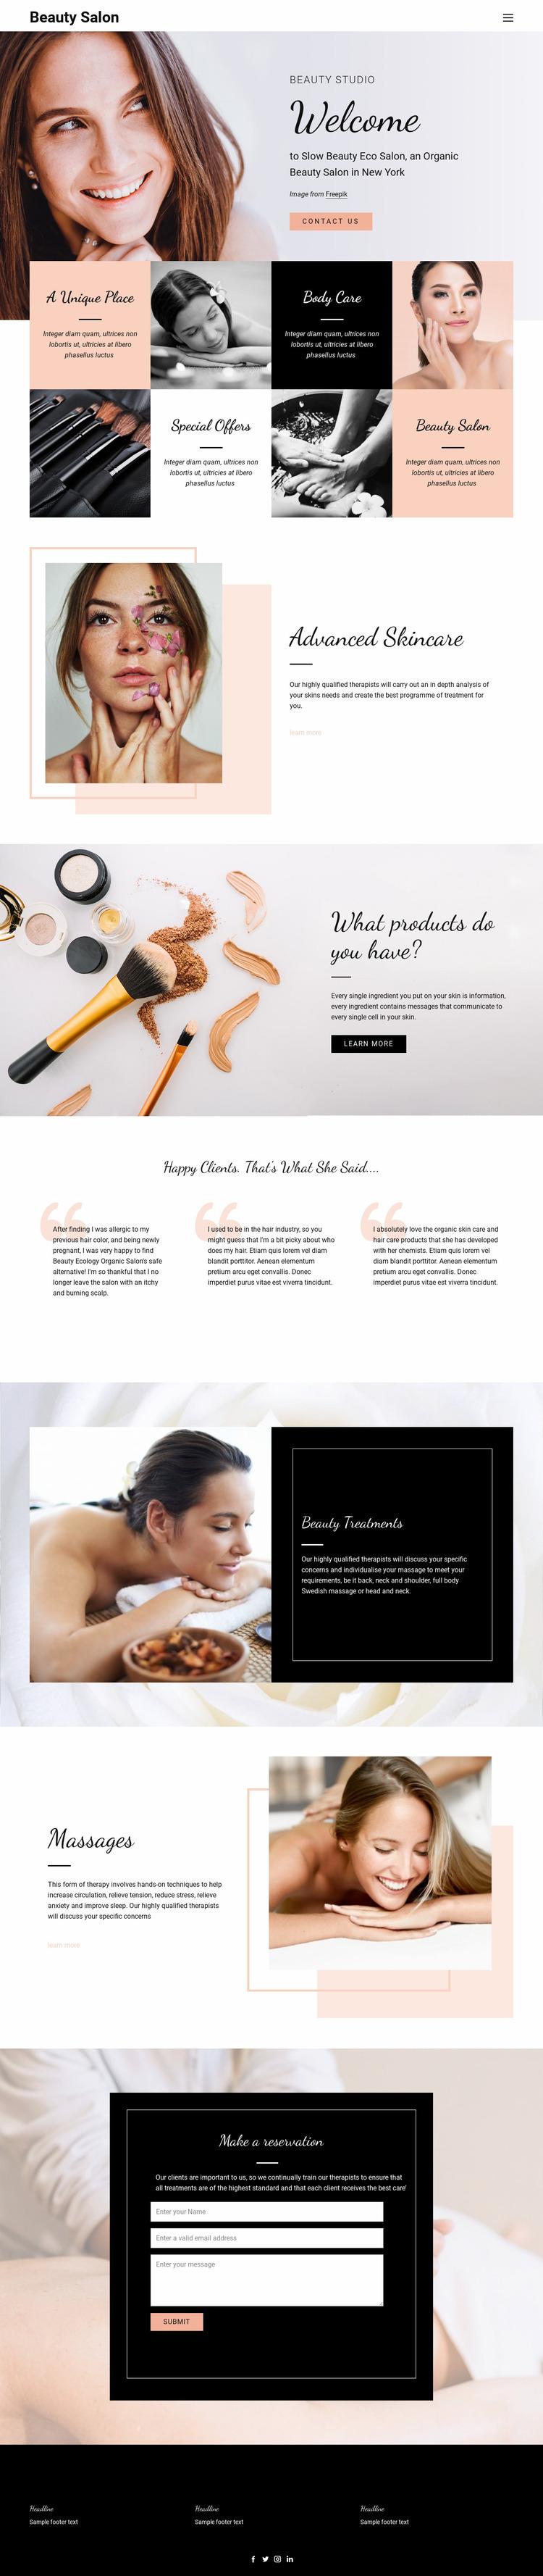 Hair, nail and beauty salon Website Mockup